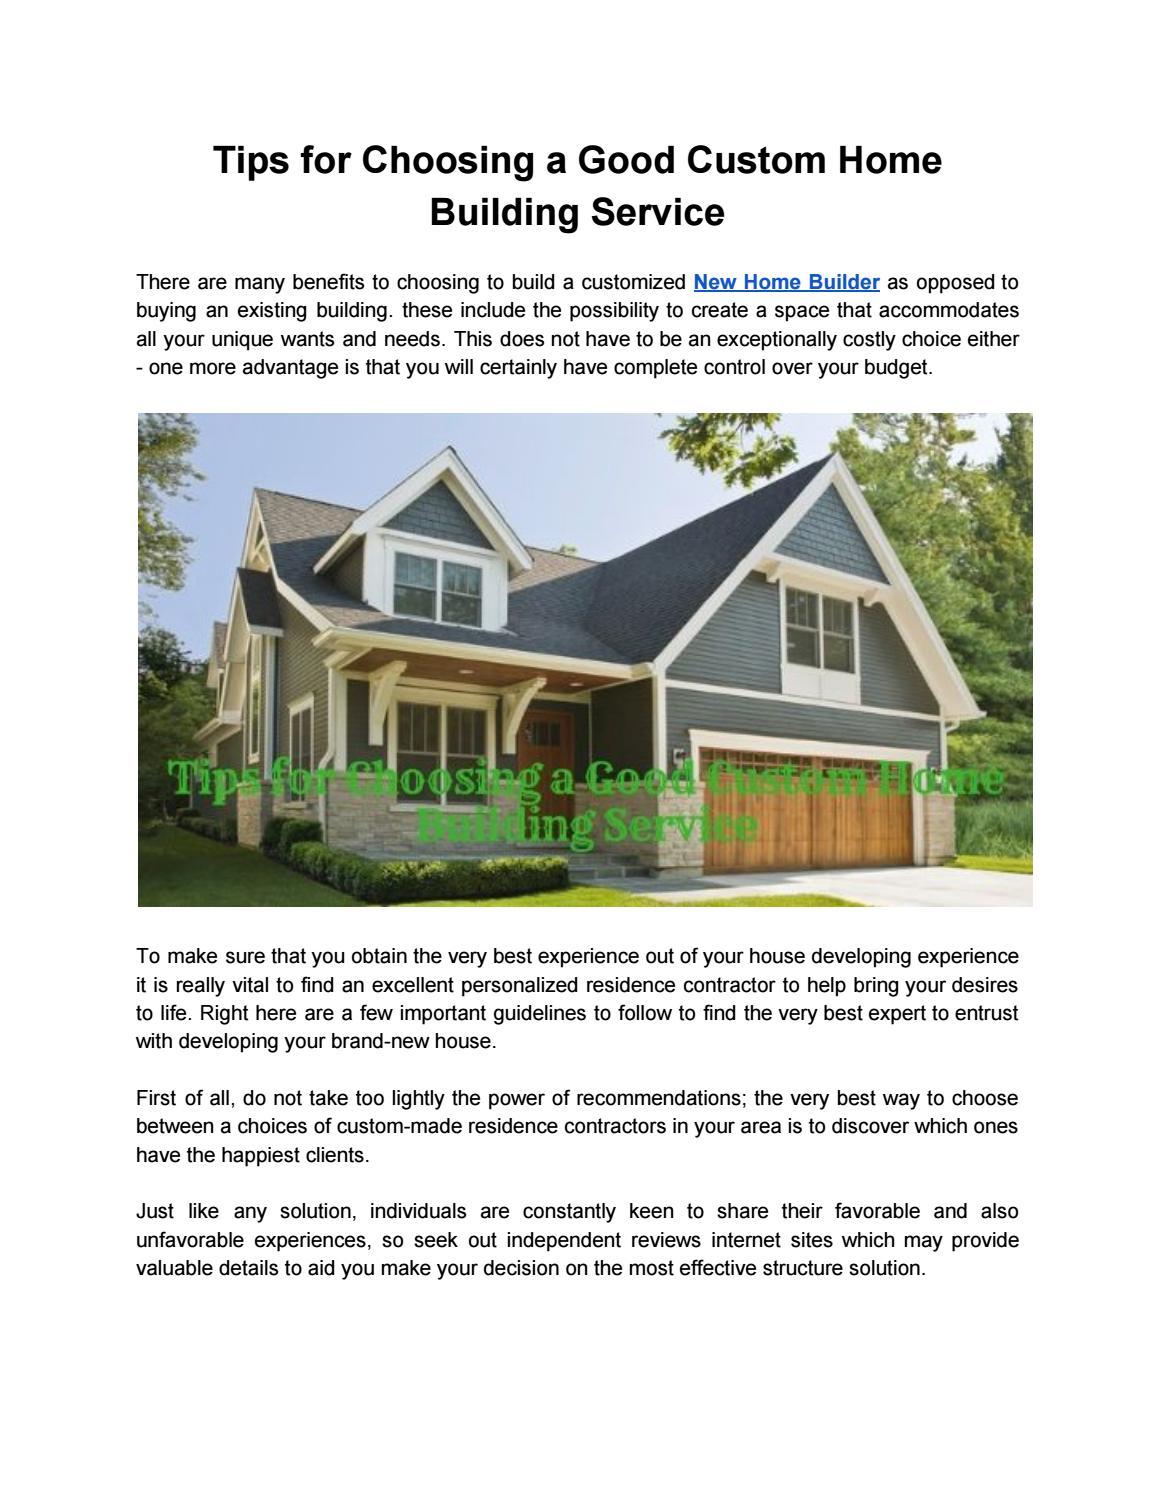 Tips For Choosing A Good Custom Home Building Service By Stevewarnerr Issuu